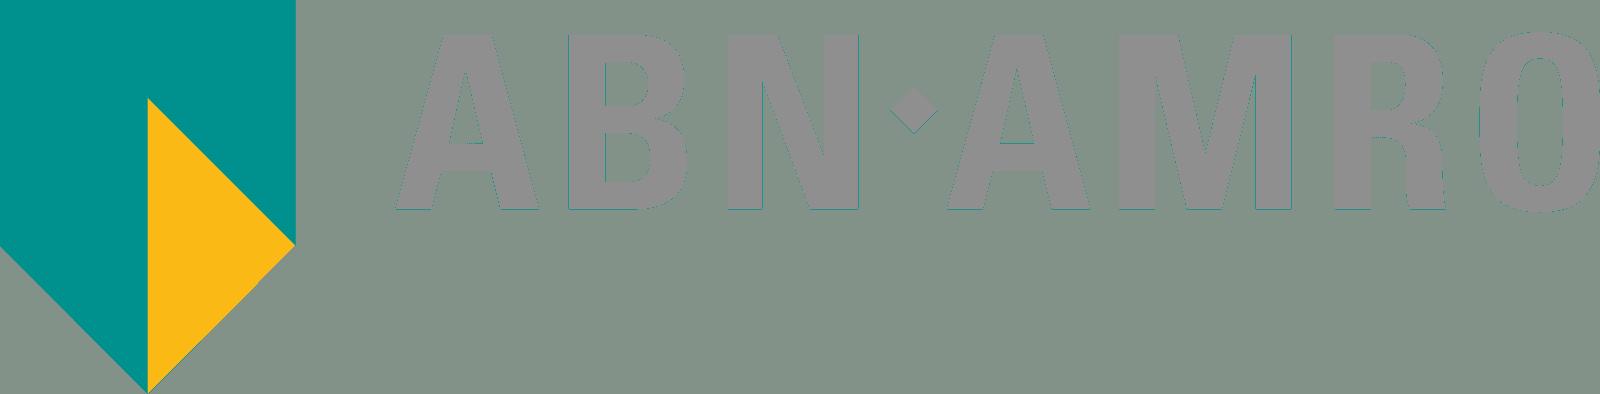 ABN AMRO logo finzie website